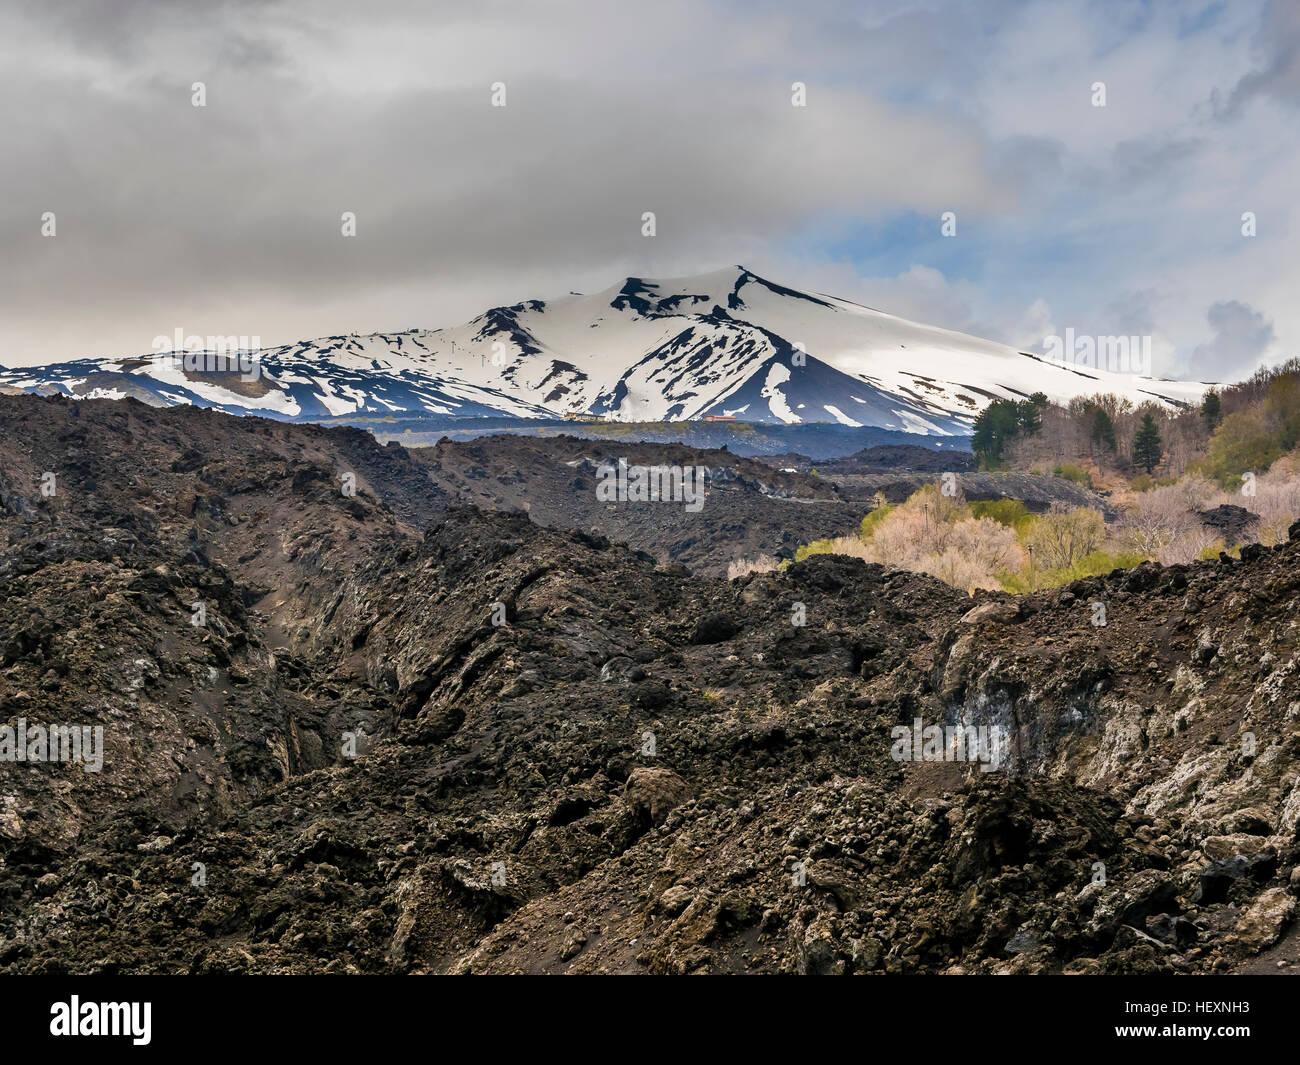 Italy, Sicily, Mount Etna, lava fields - Stock Image